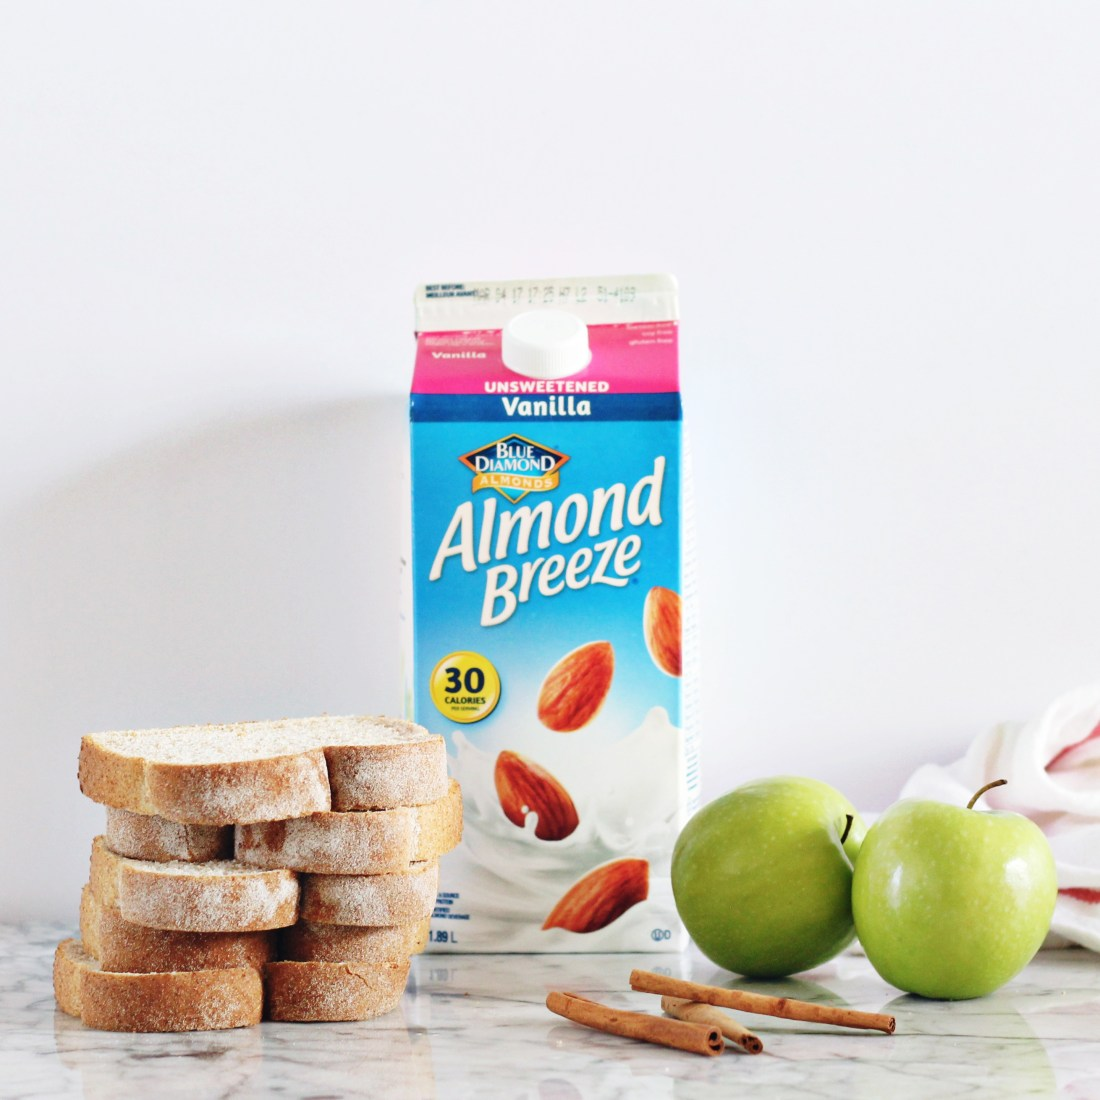 Apple Cinnamon French Toast Bake ingredients